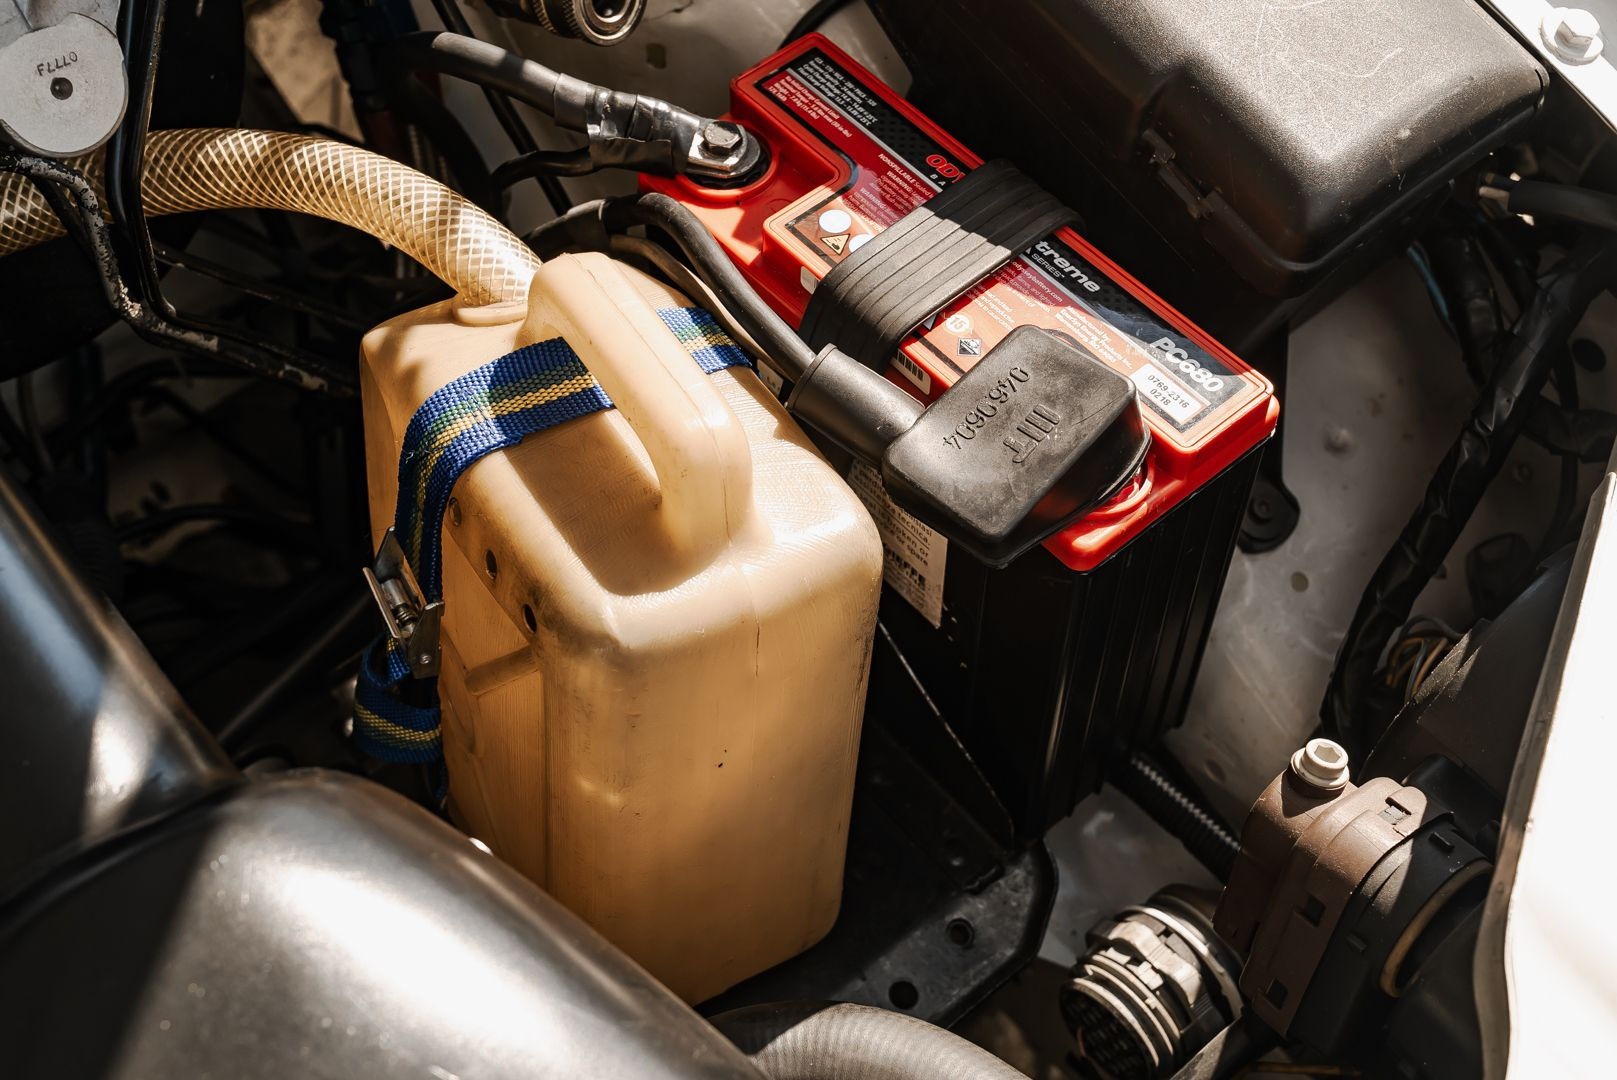 1998 Peugeot 106 Rallye S16 Group A 83127